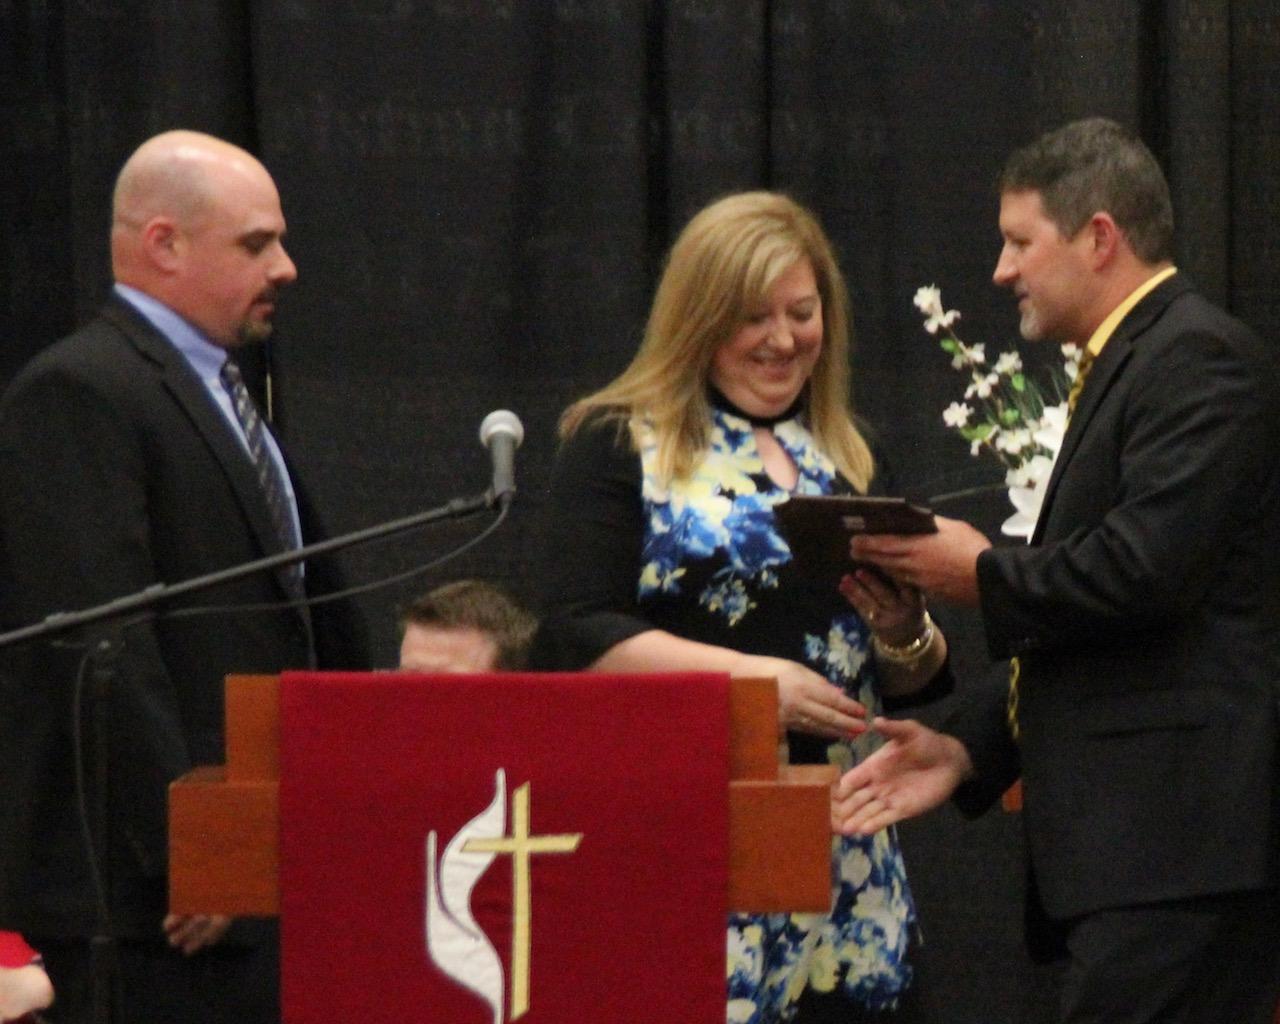 Jim and Beth Knight, Benning Service Award